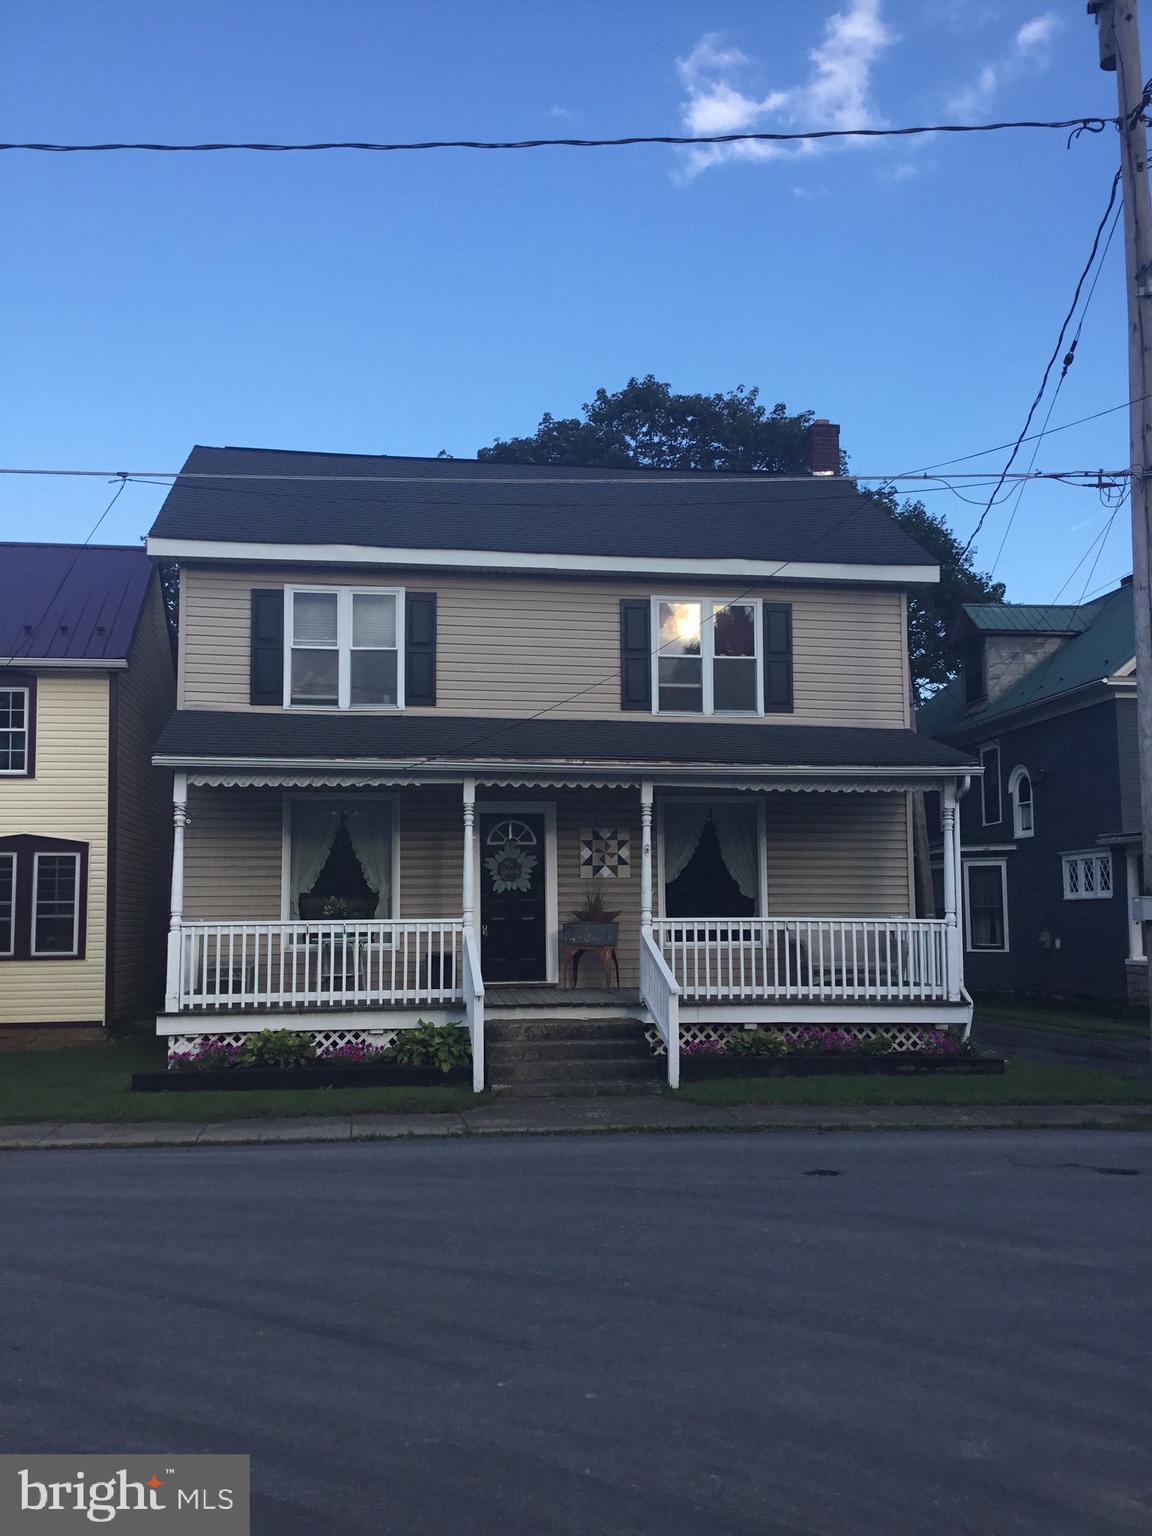 18752 MAIN STREET DRY, DRY RUN, PA 17220